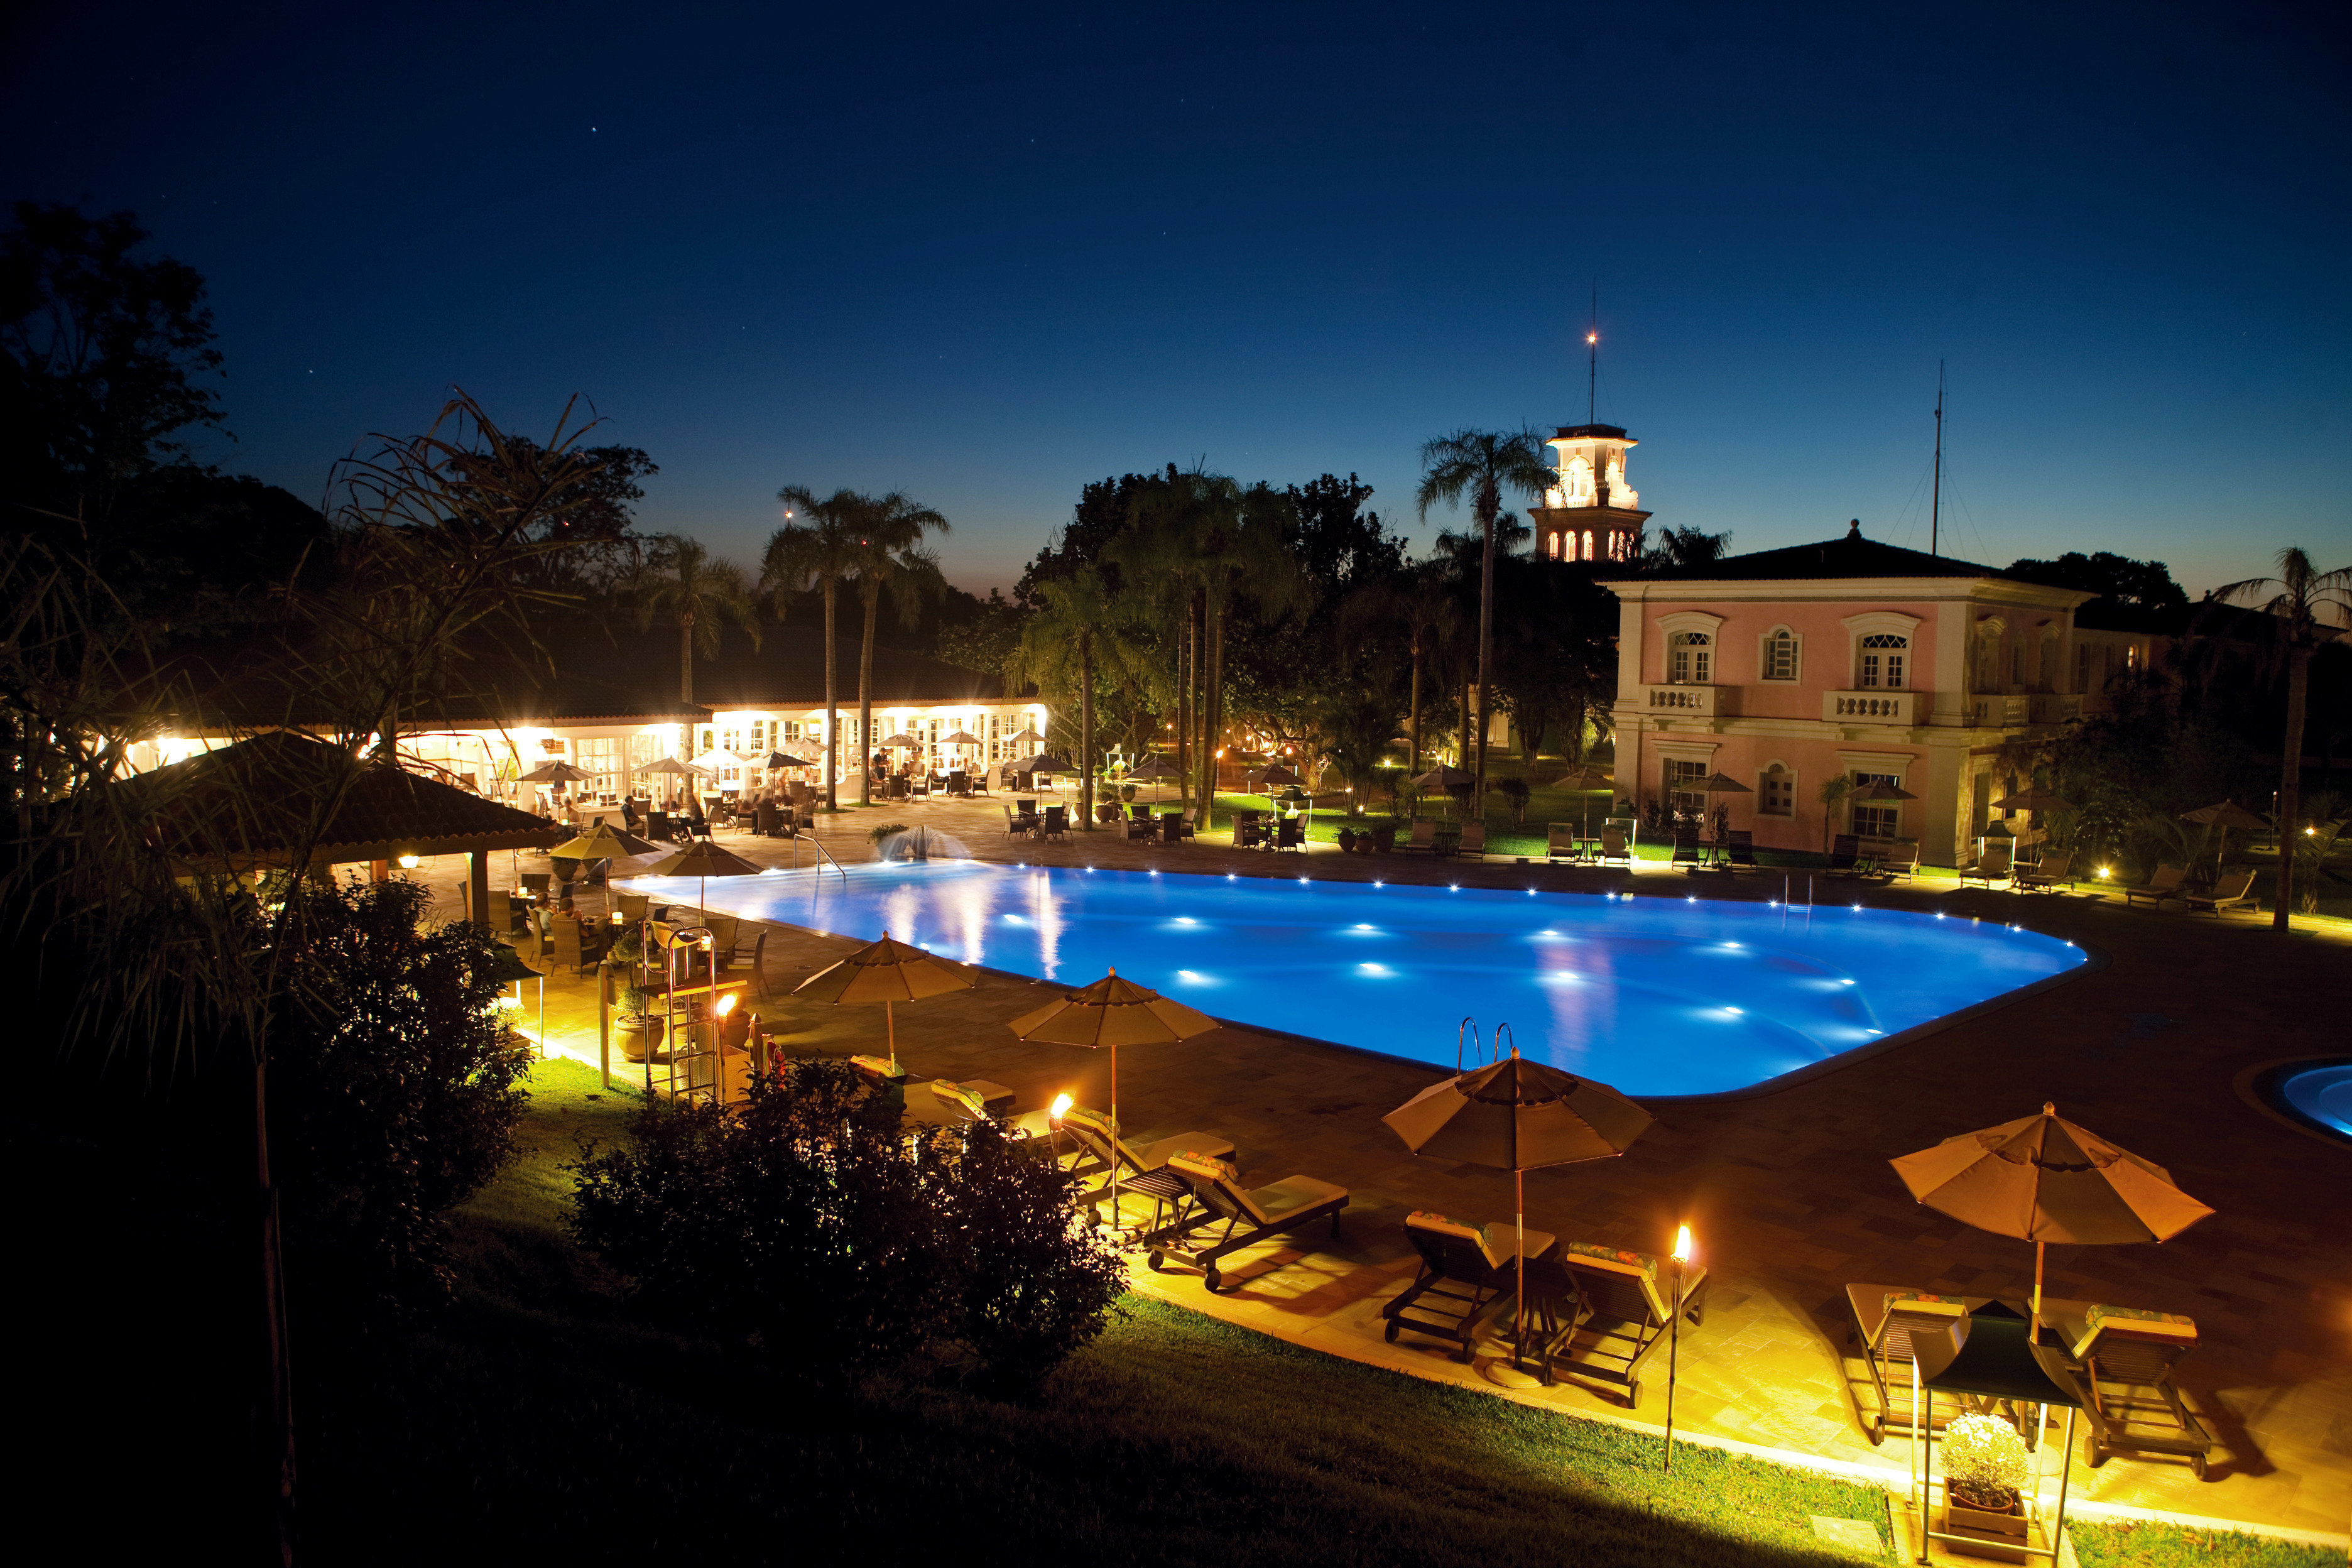 Nightlife Play Pool Resort sky tree night evening swimming pool dusk